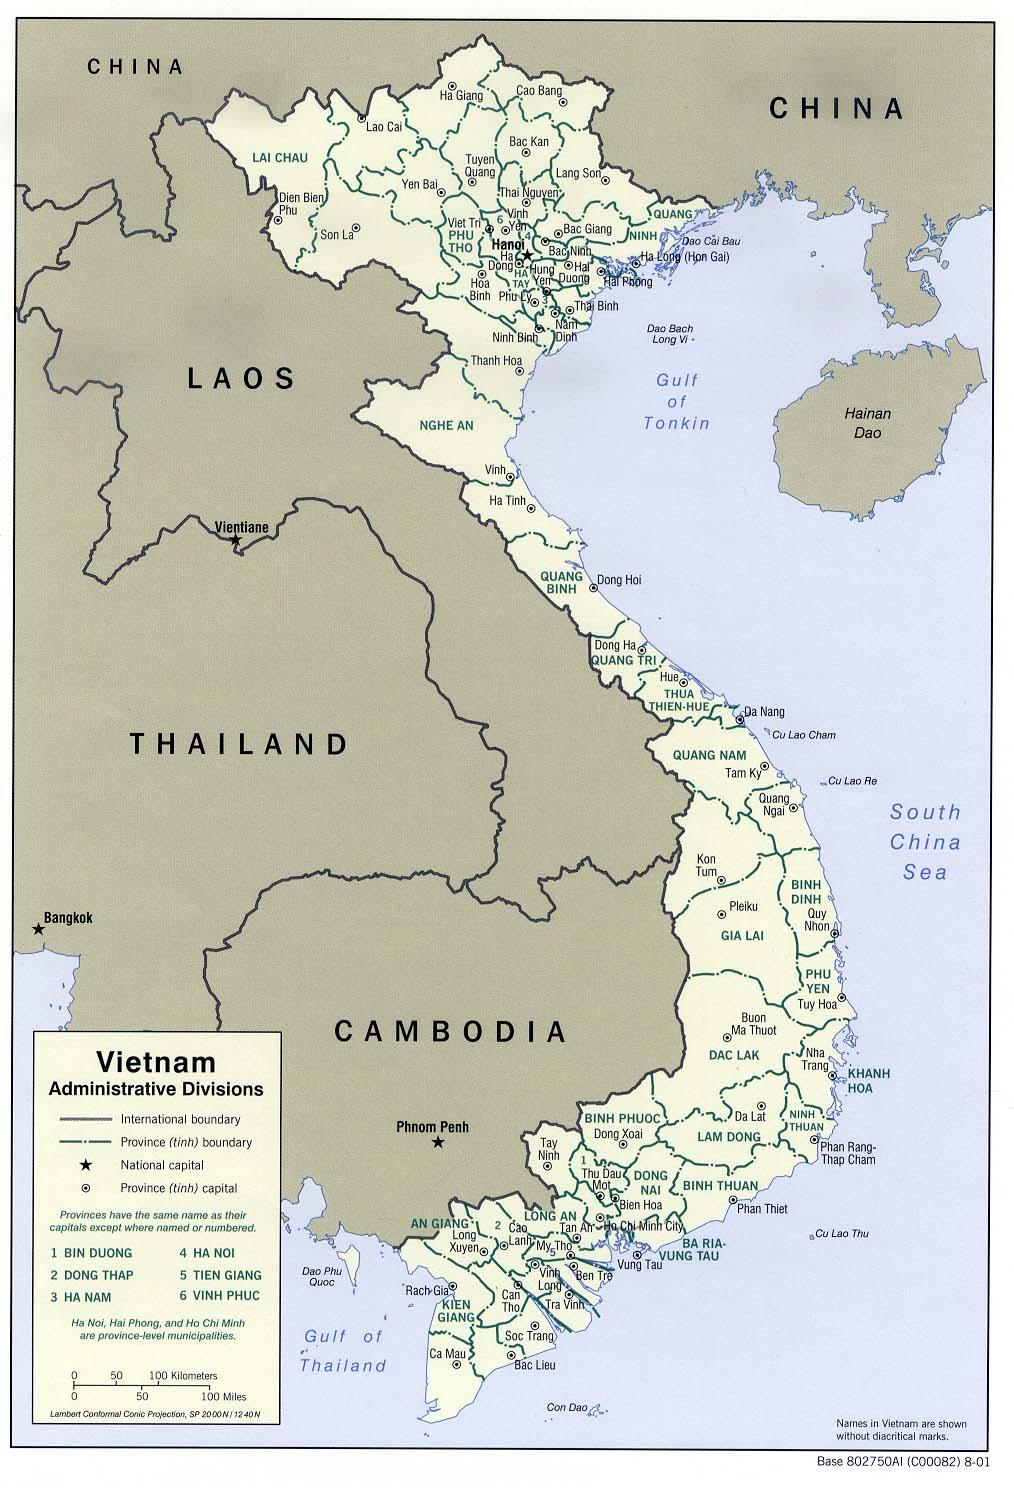 Viet Nam - Maps - ecoi.net